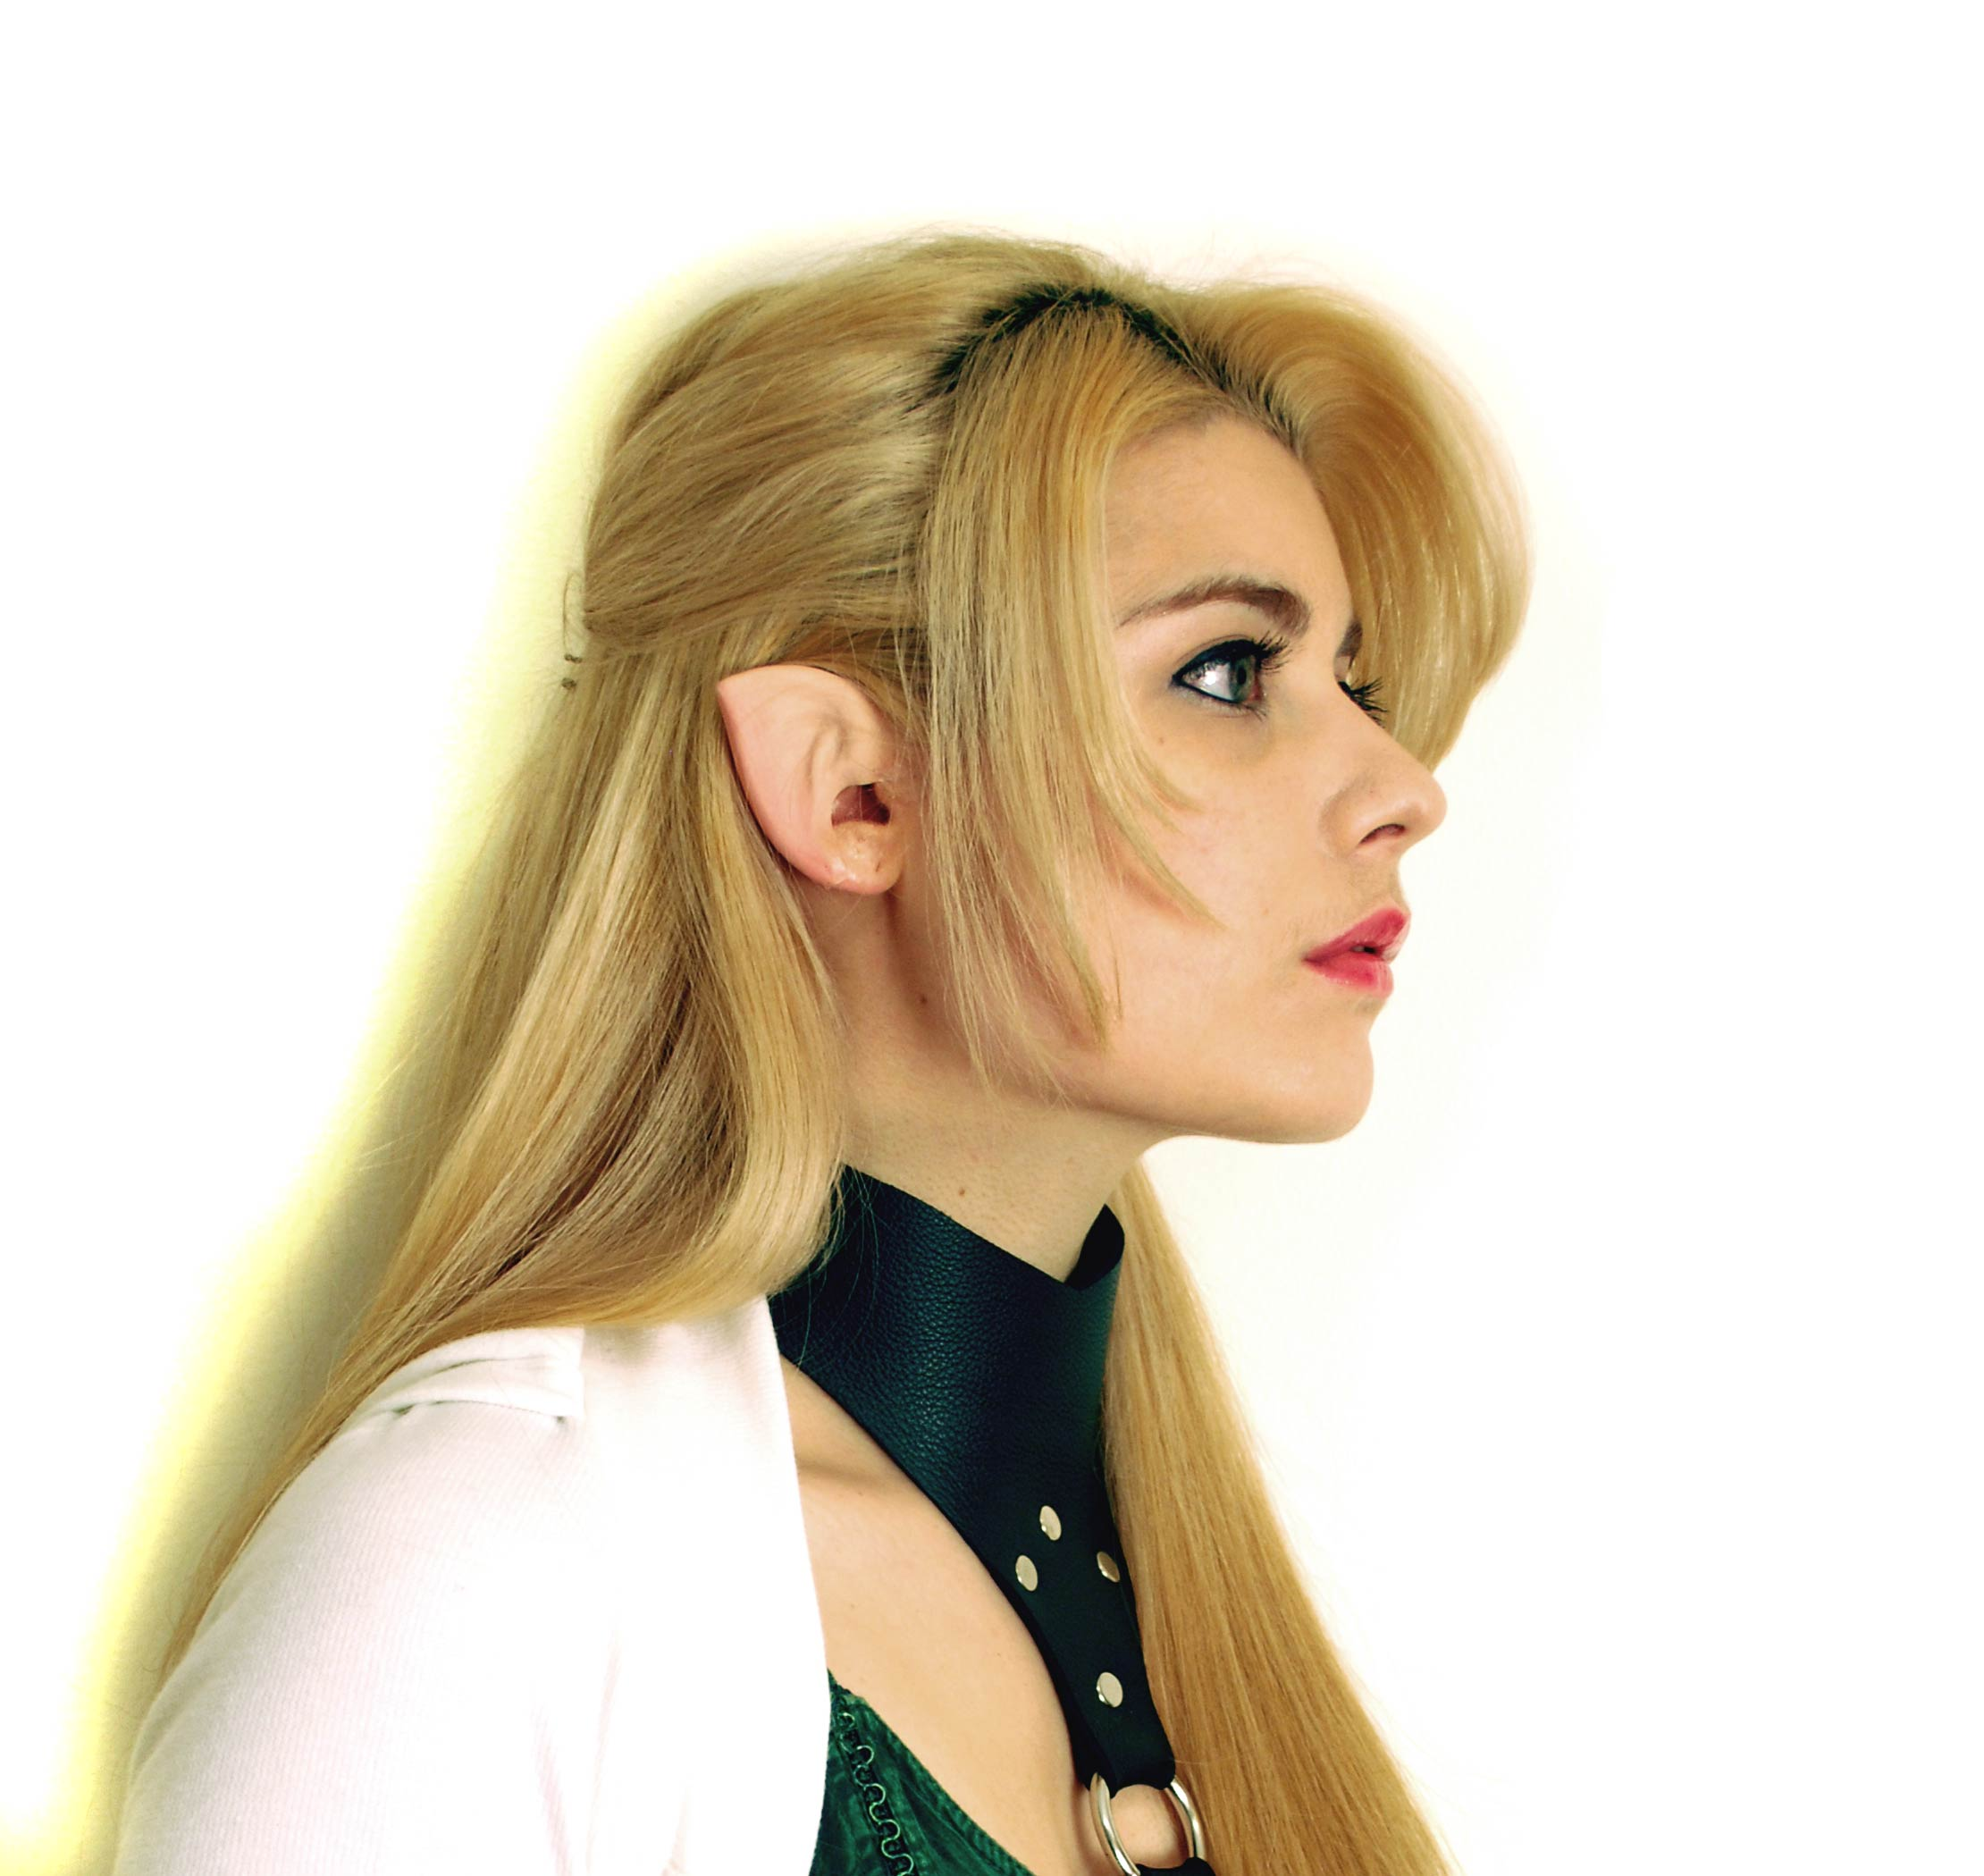 How to Apply Costume Elf Ears by Aradani